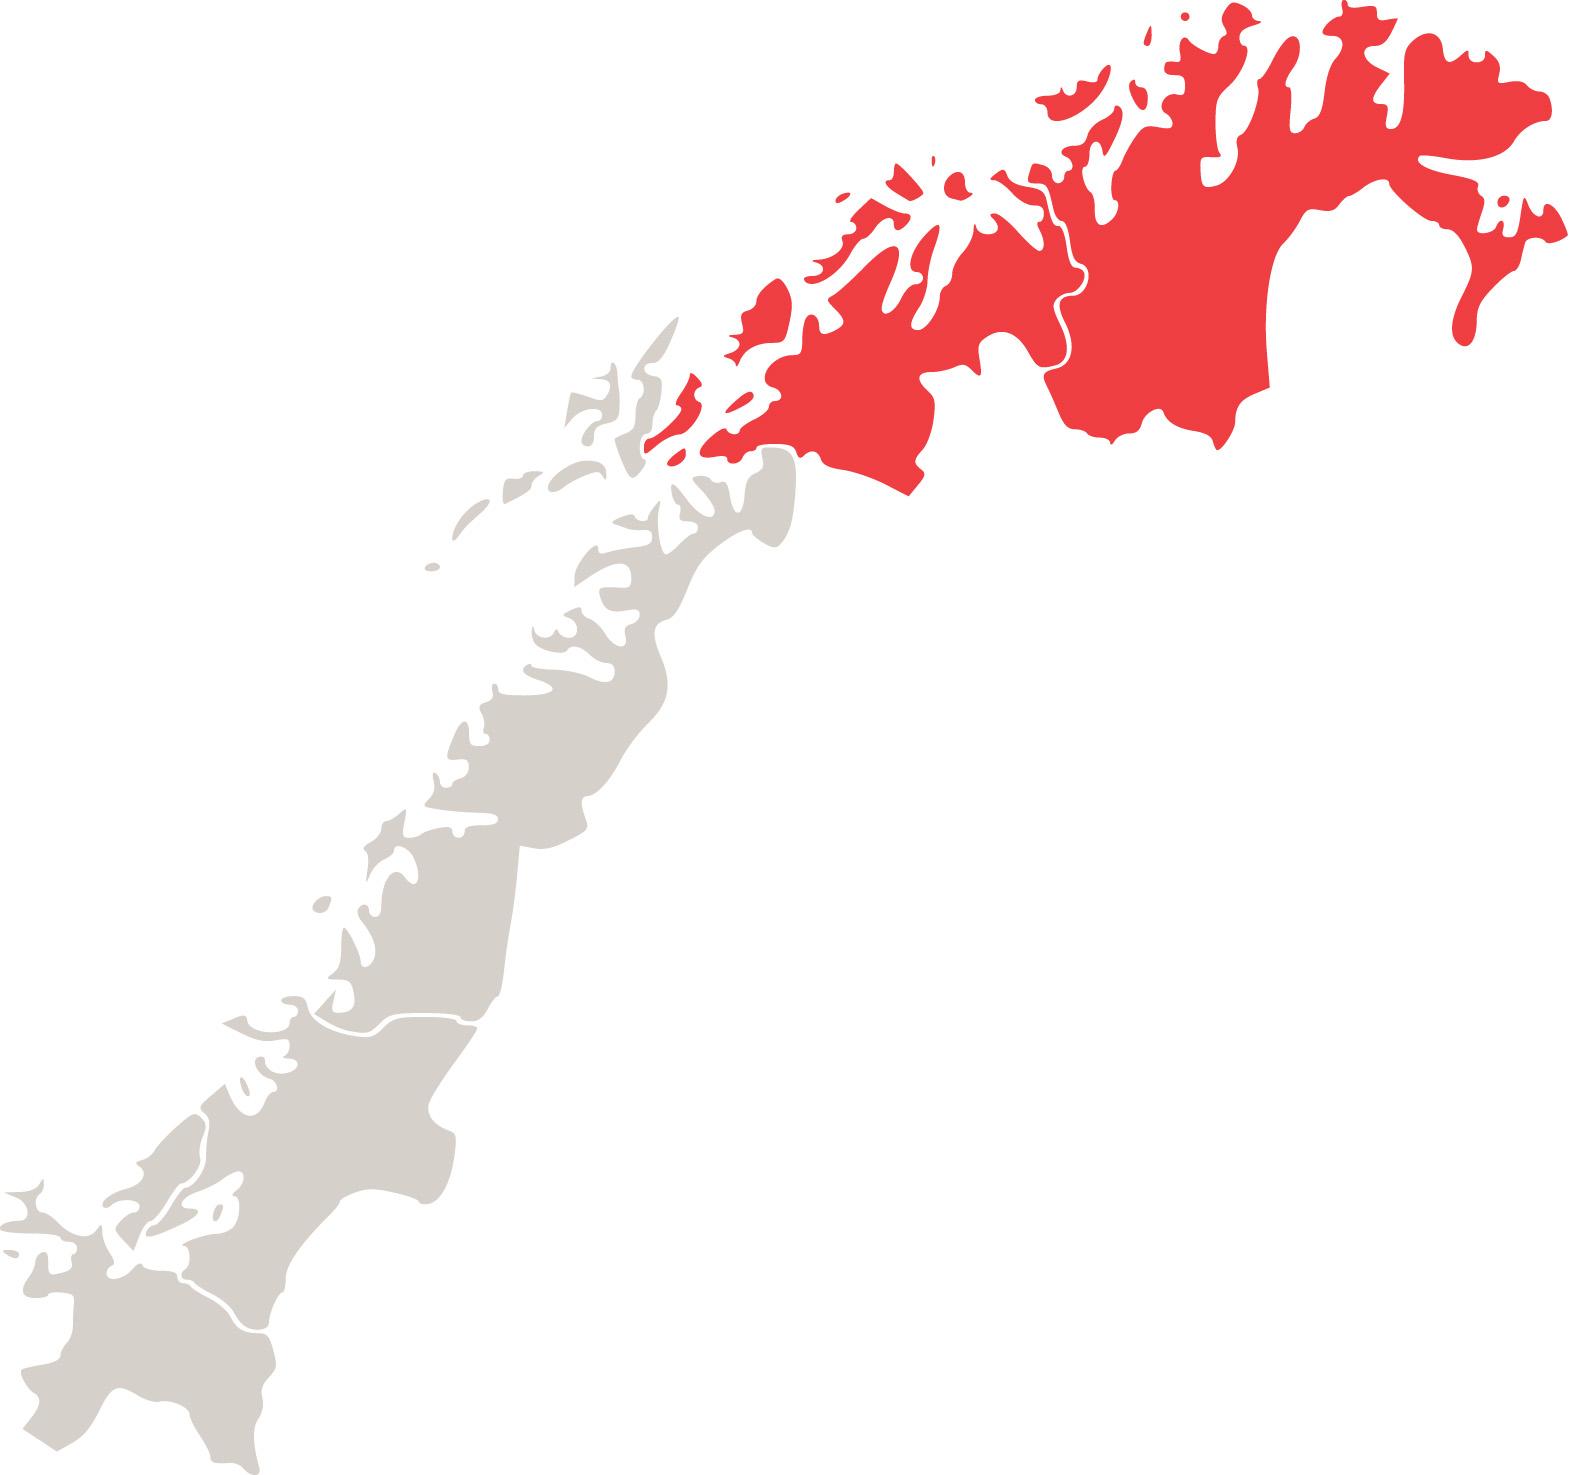 PATTAYA NURU MASSAGE NORSKE NAKNE DAMER